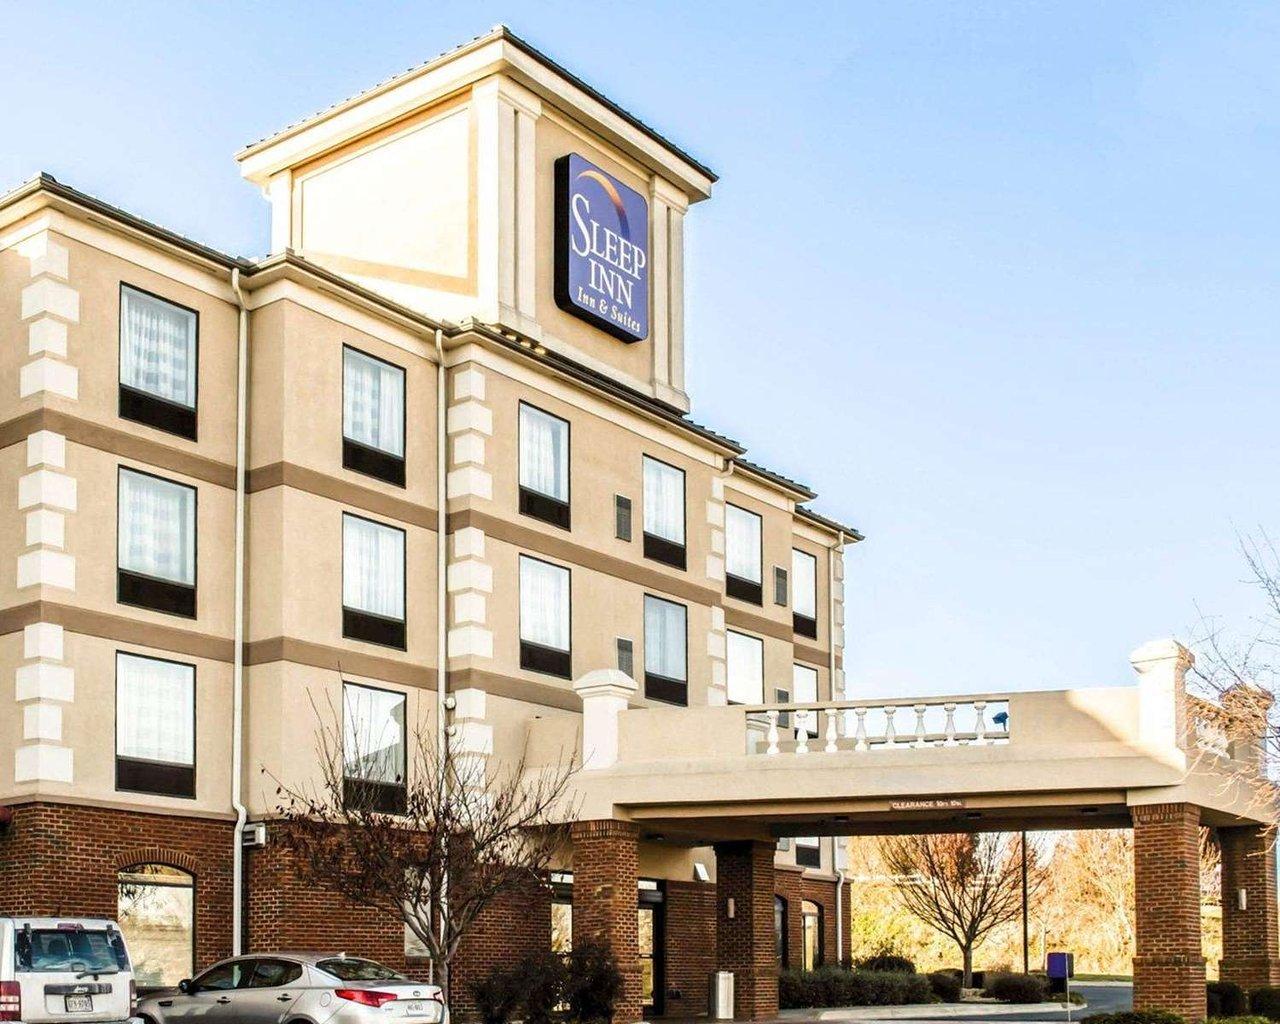 Sleep Inn Suites 67 9 2 Updated 2018 Prices Hotel Reviews Lexington Va Tripadvisor